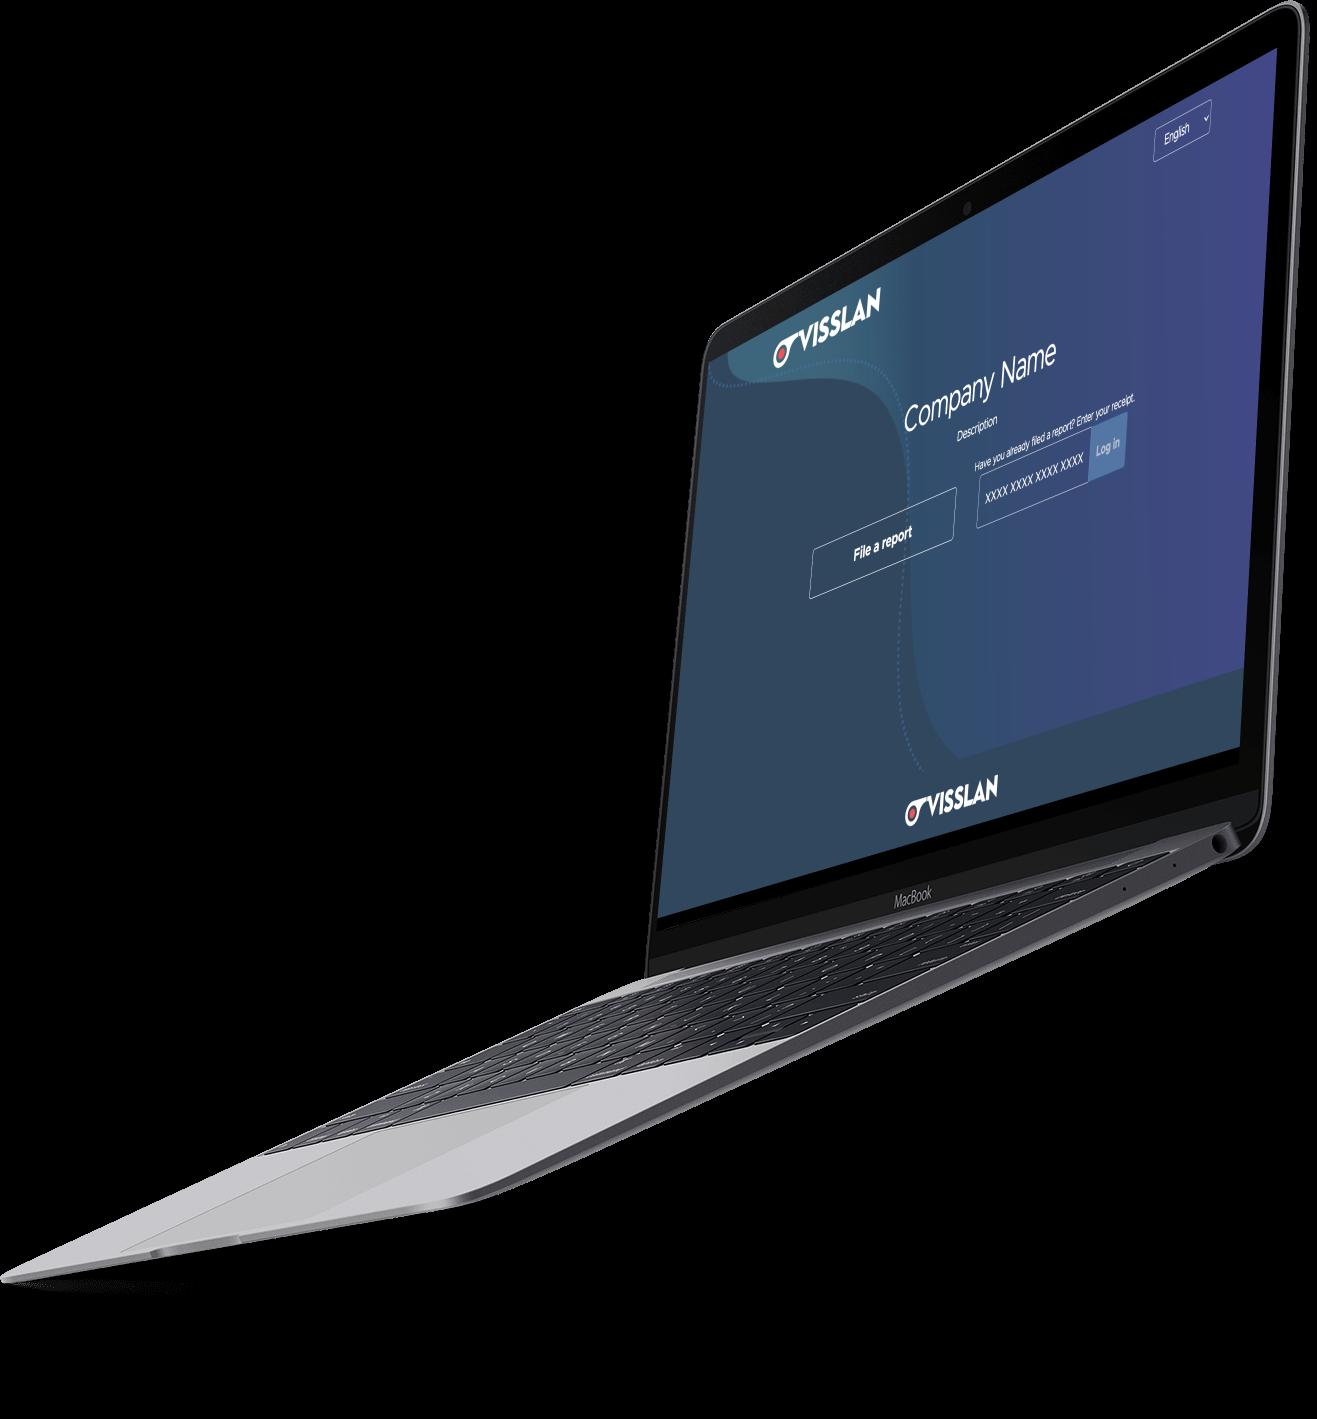 Mockup image of laptop with Visslans whistleblowing system